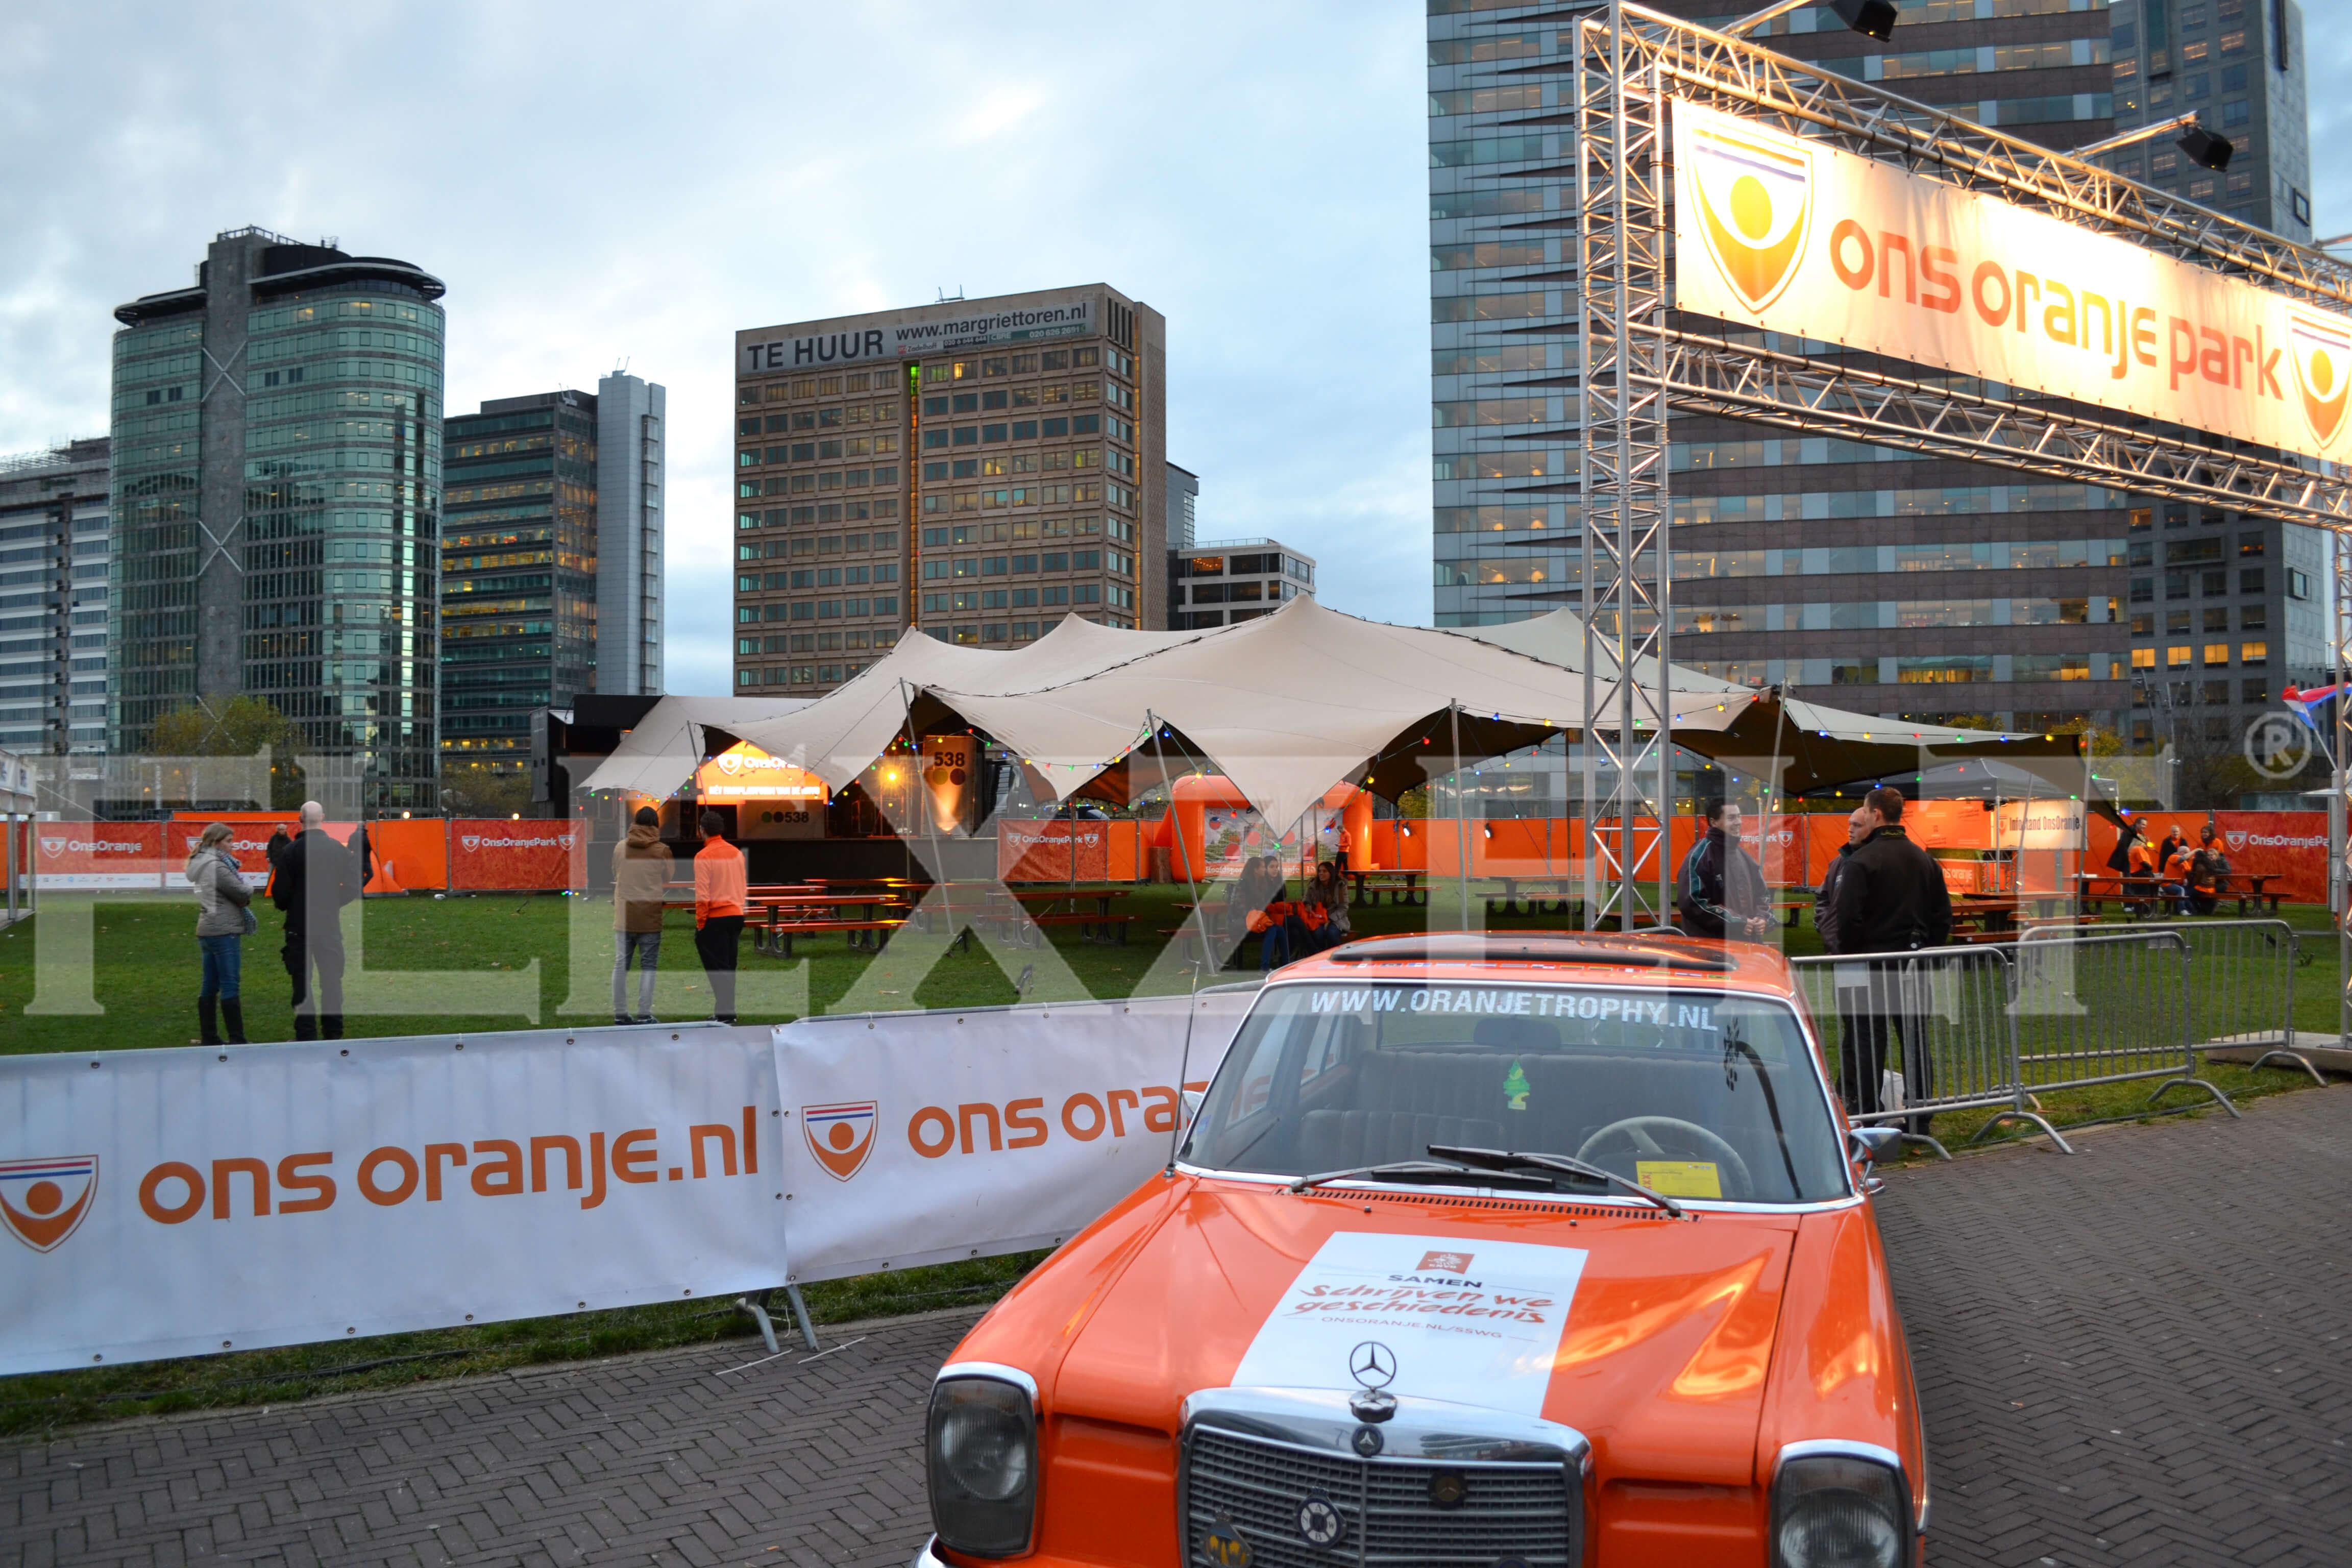 Flexzelt® - Flextent® - Stretchtent - Ons Oranje Park